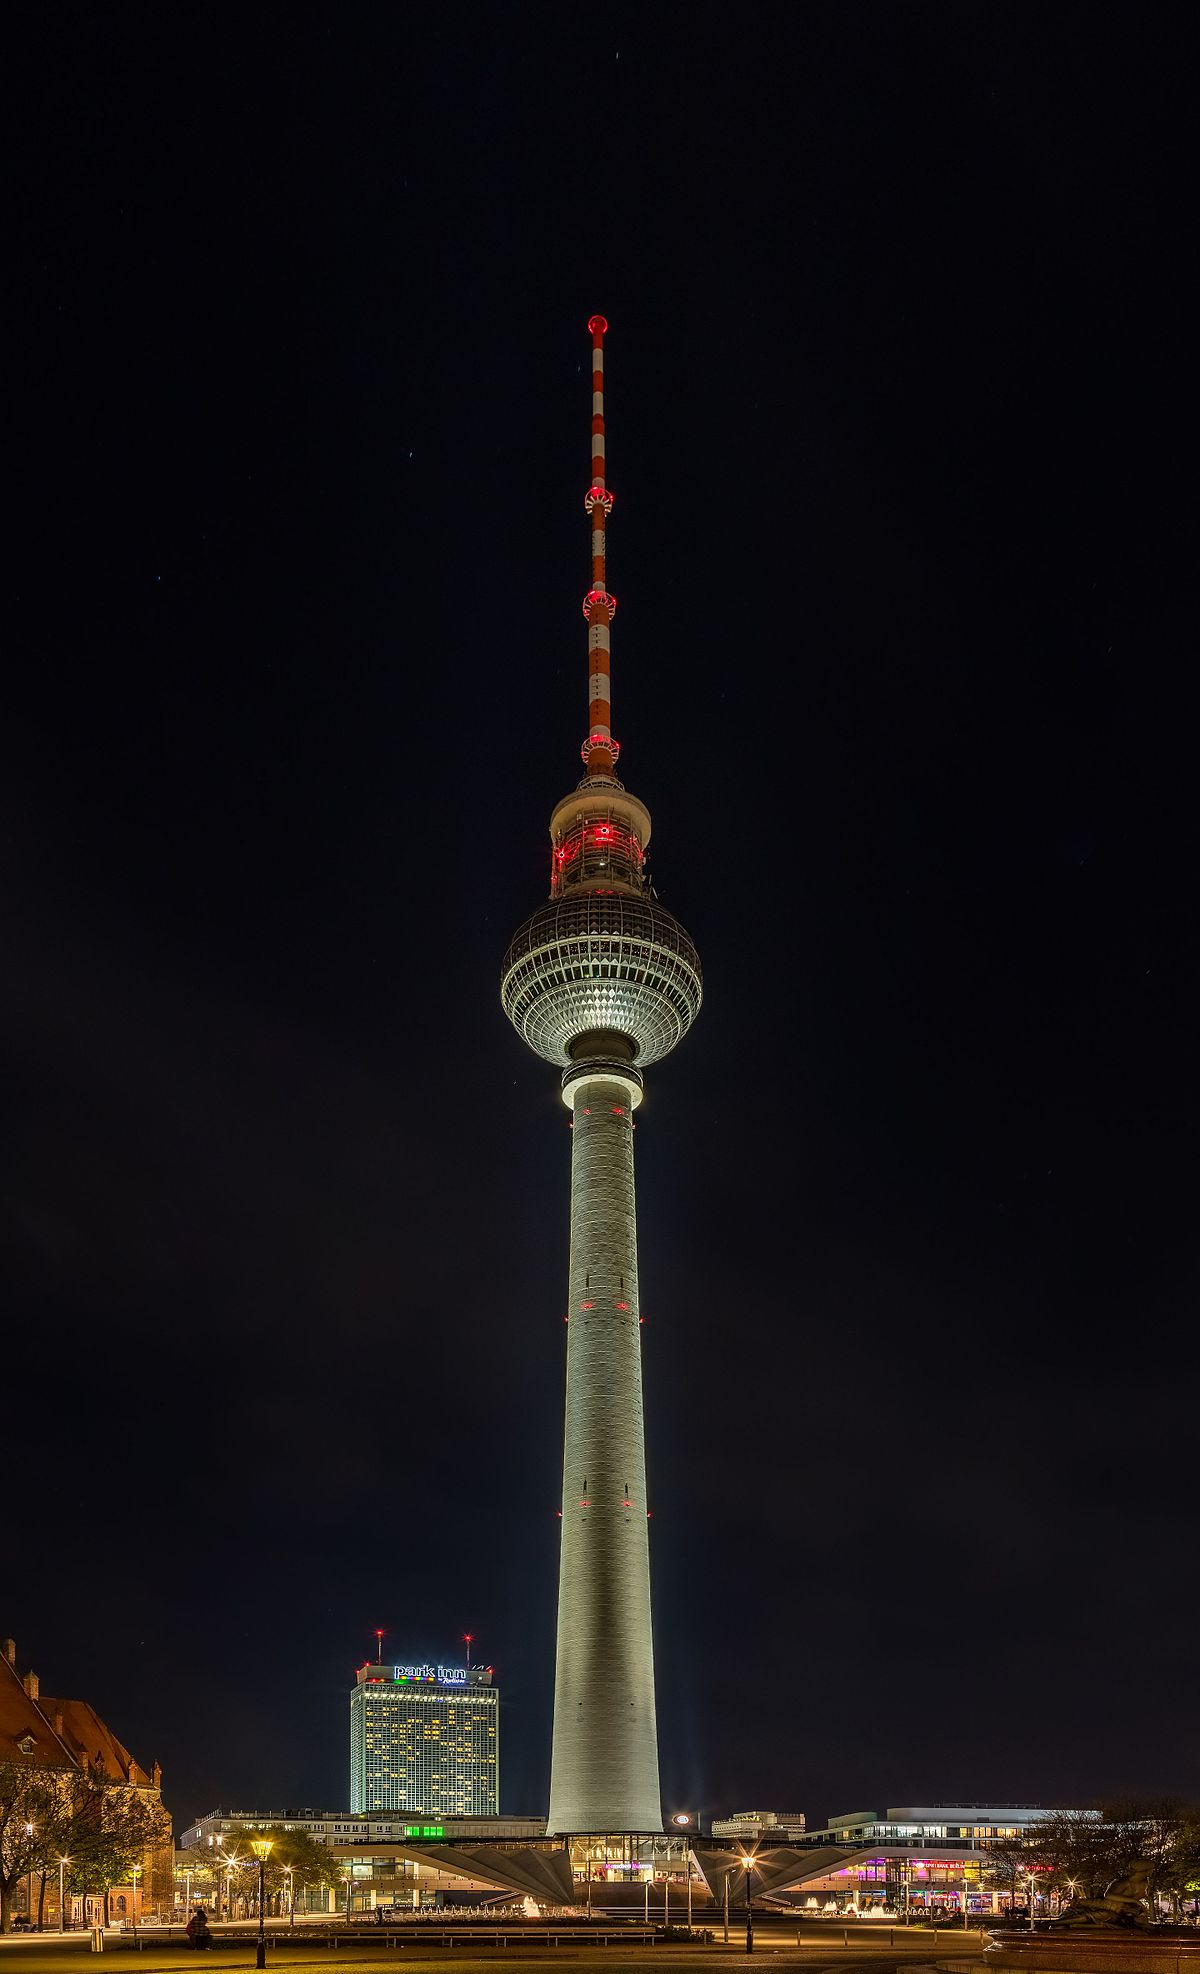 Torre de telecomunicaciones de Berlín - Wikipedia, la ...